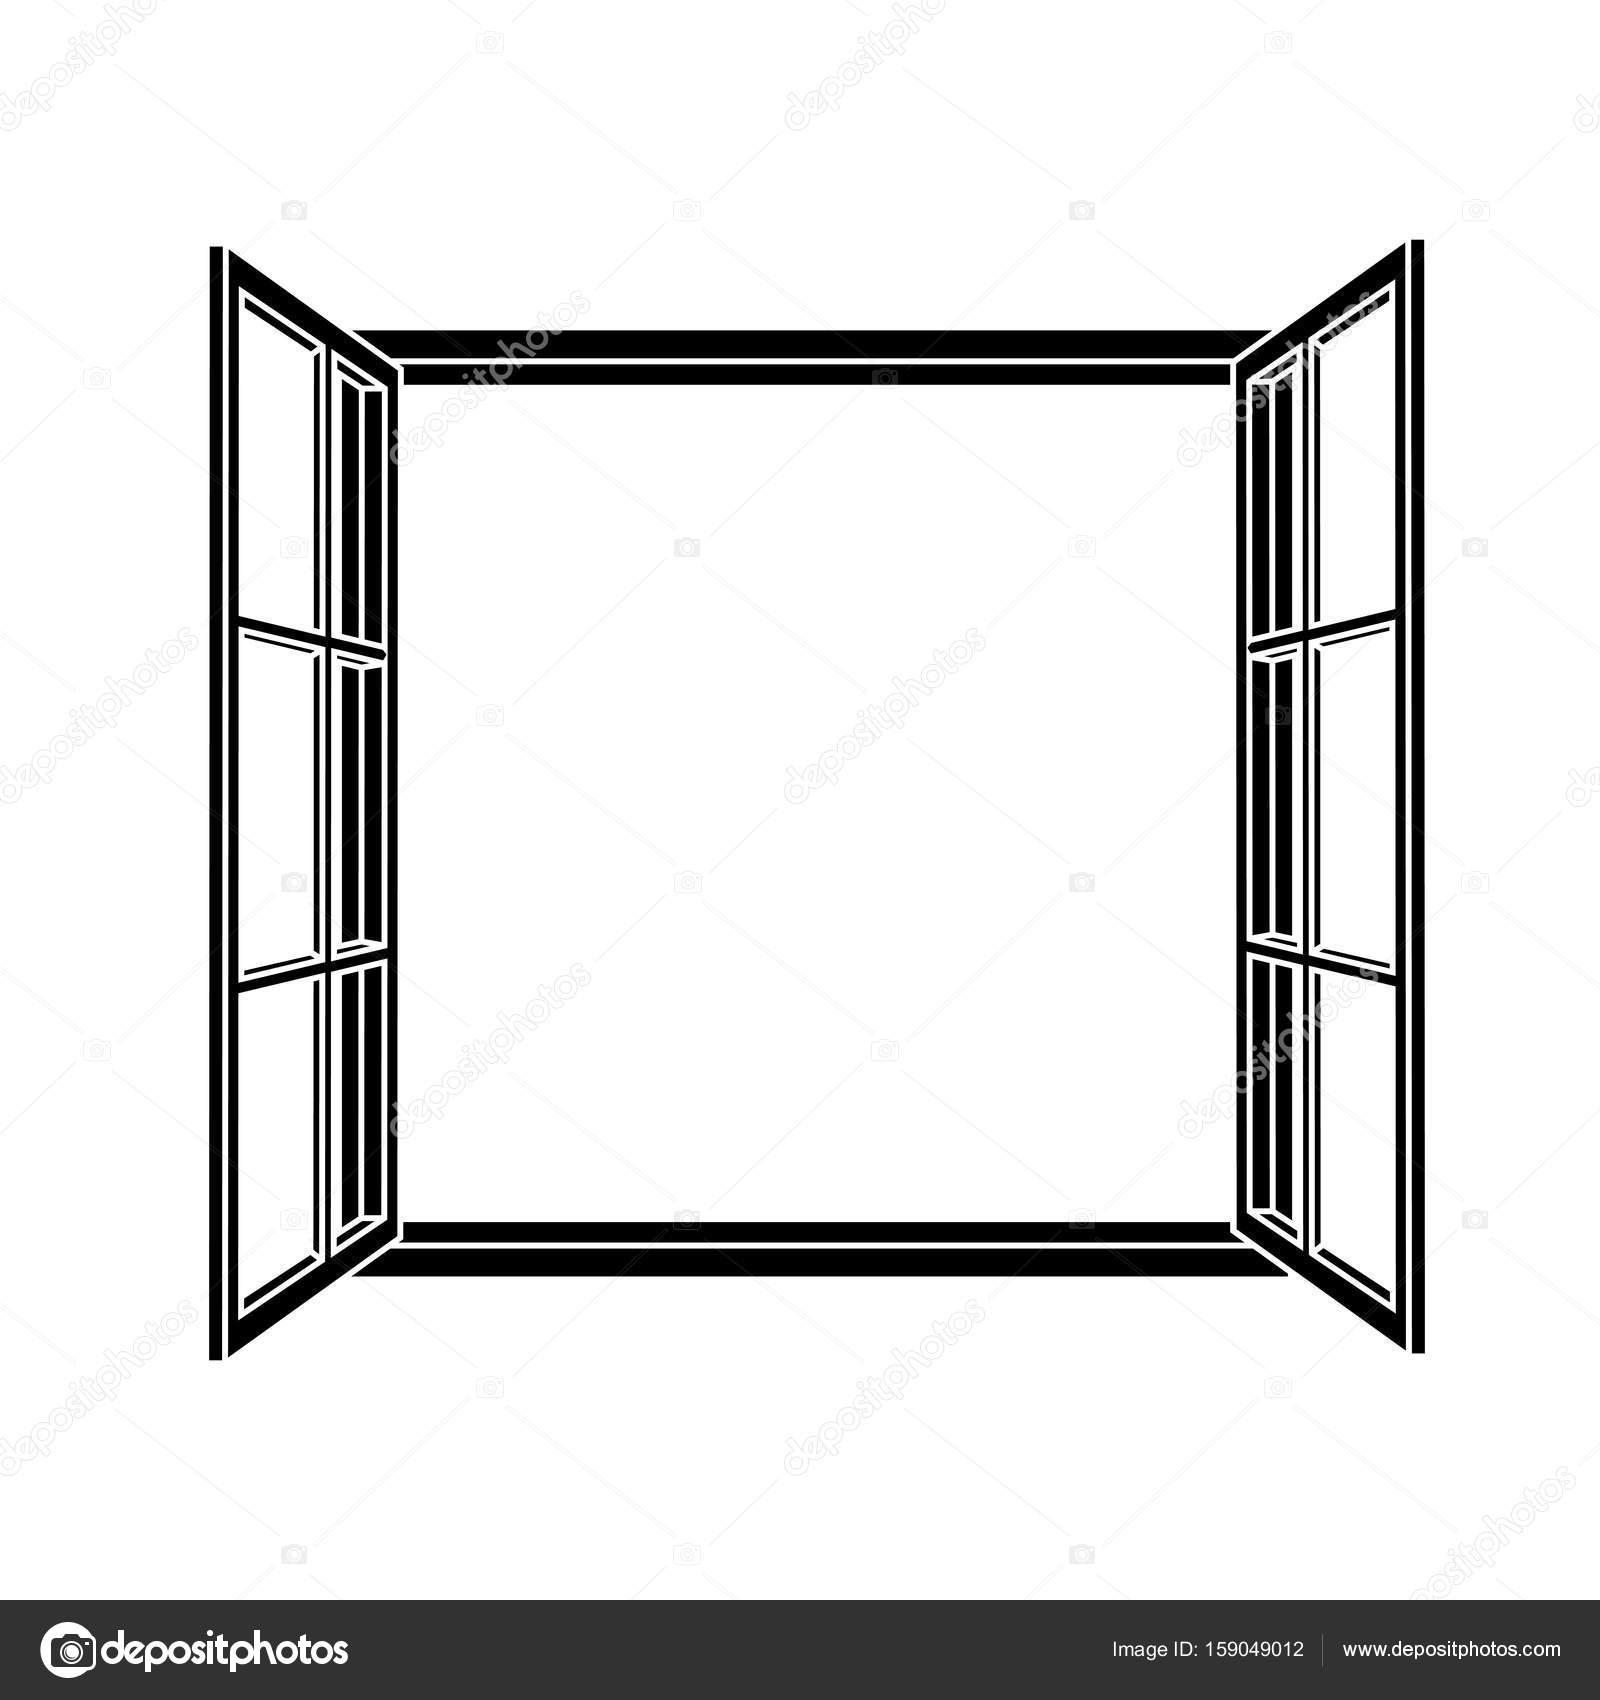 Fenster-Rahmen-Symbol — Stockvektor © laiaiksoon #159049012